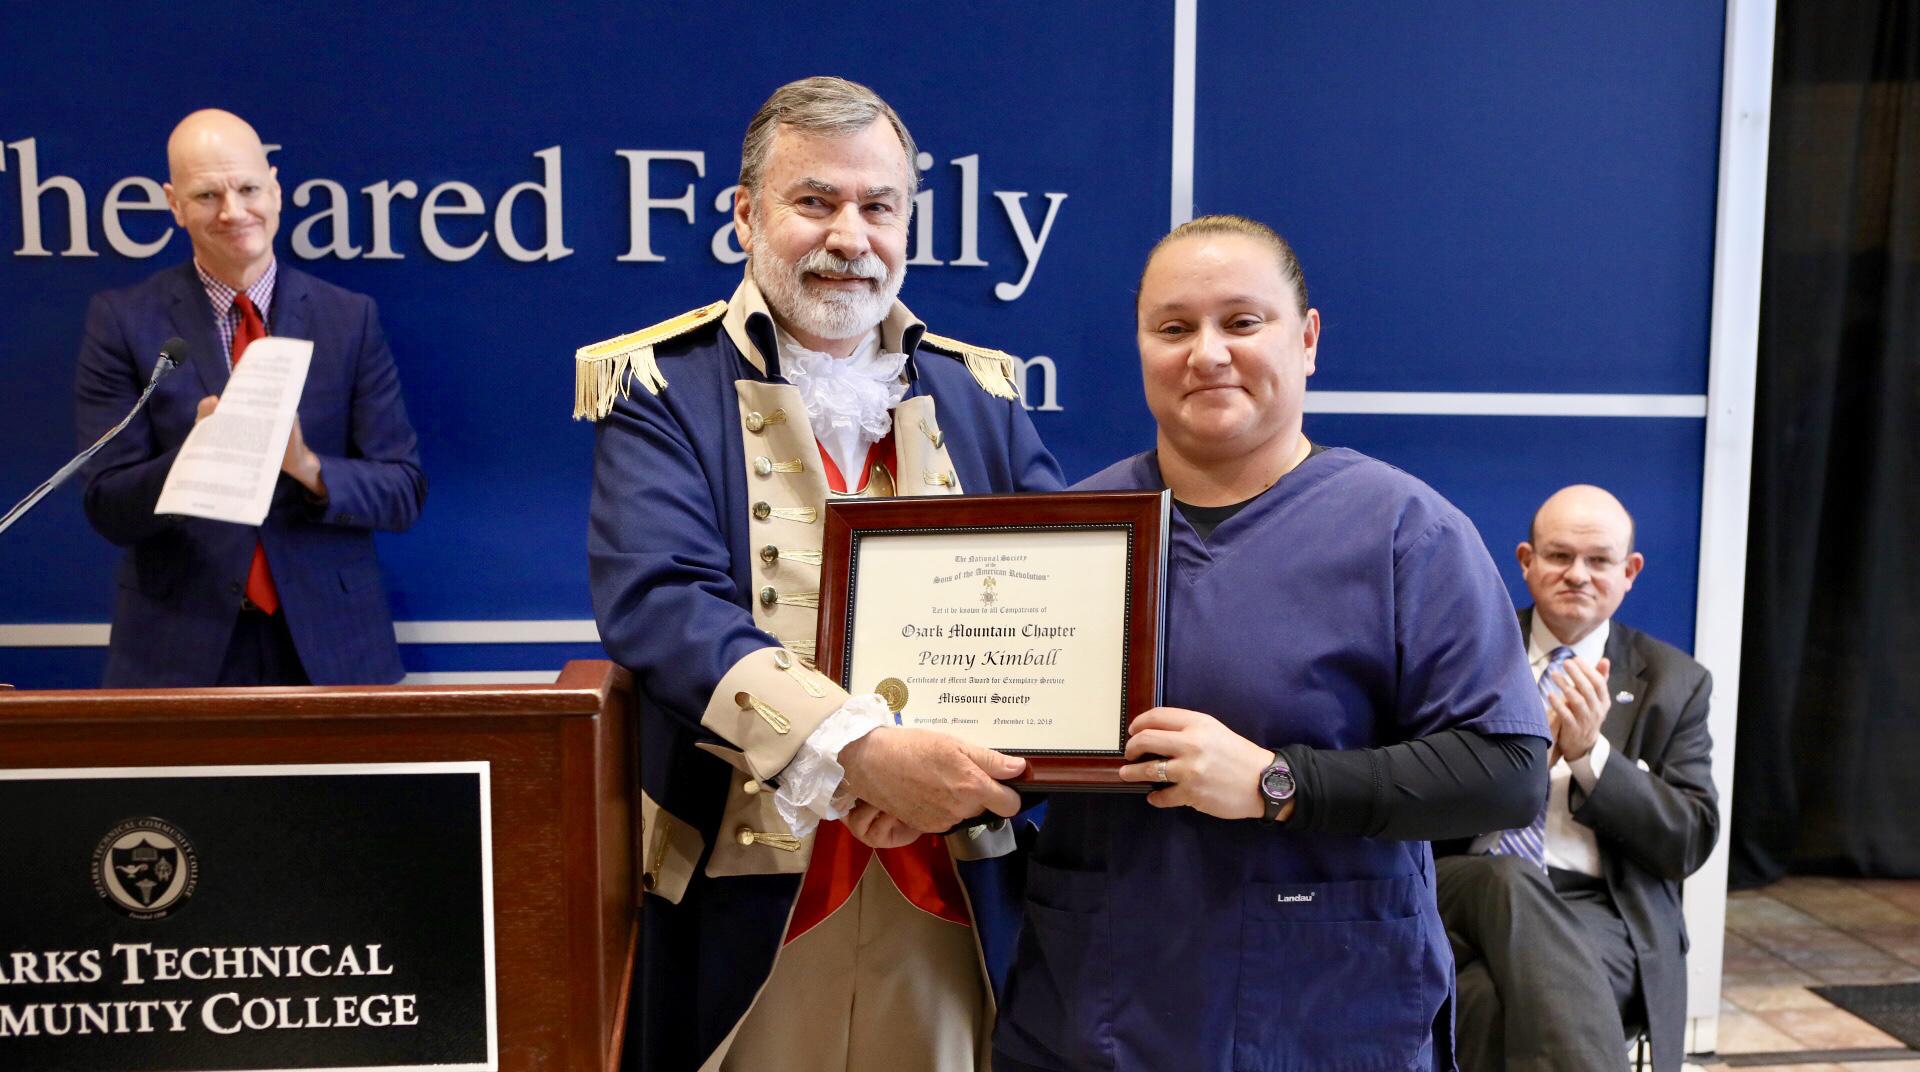 Outstanding Veteran Award